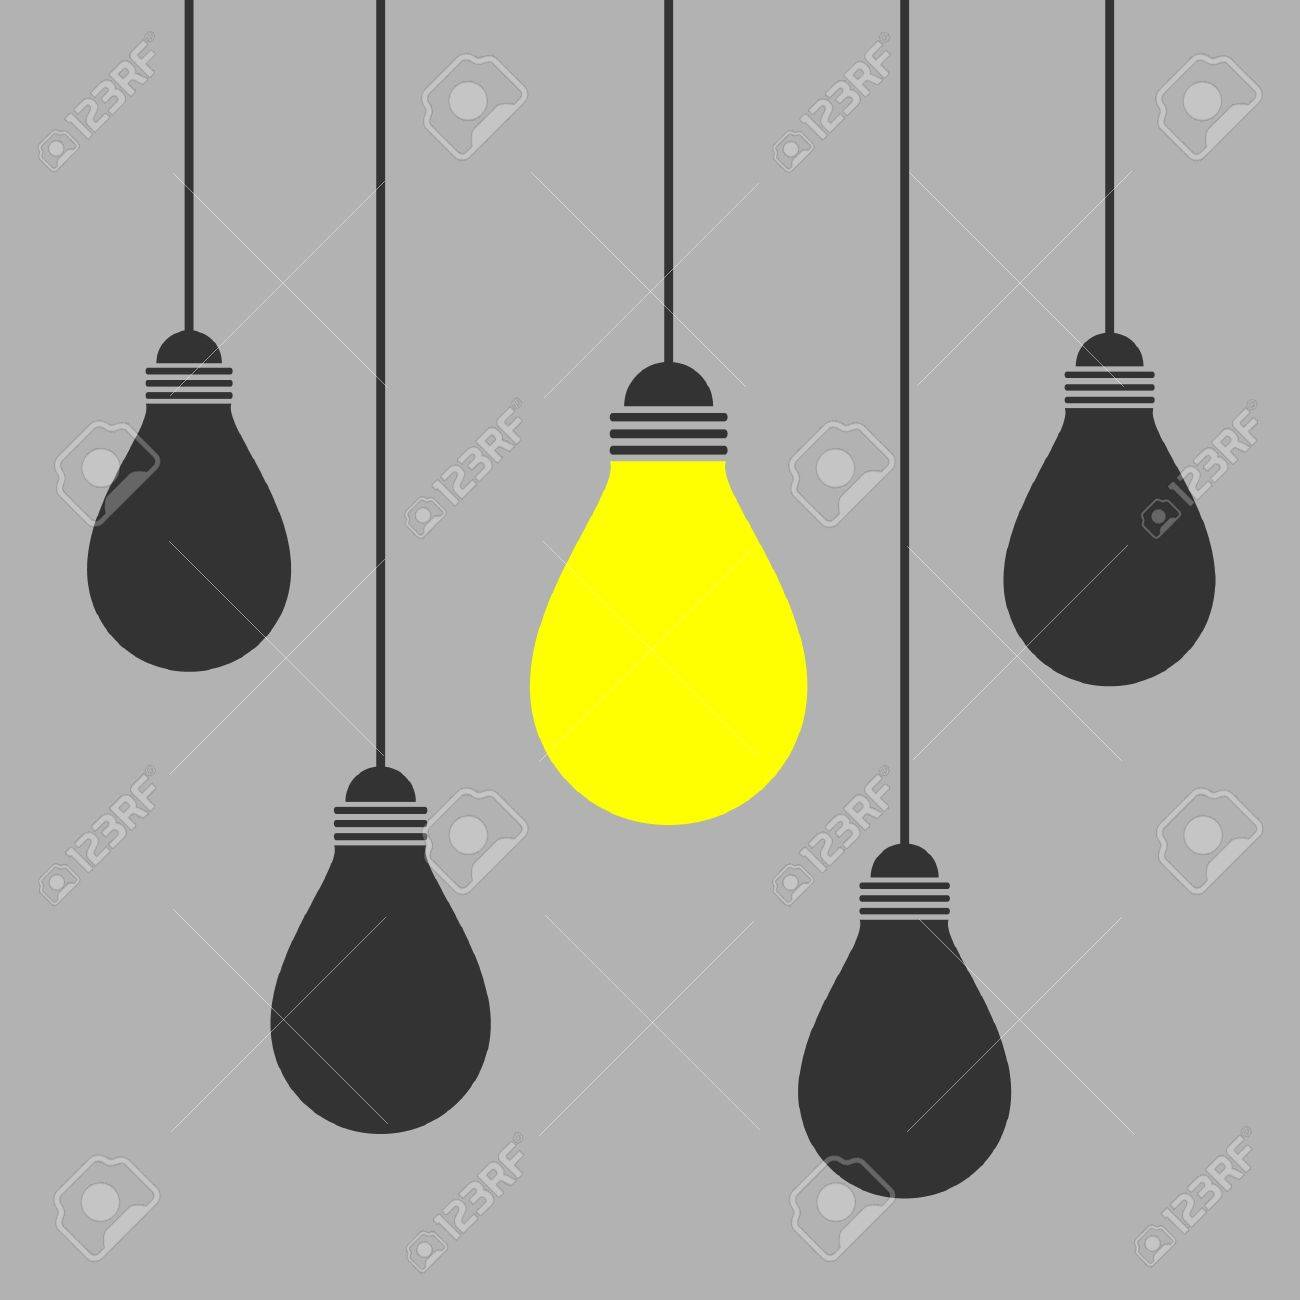 Hanging Light Bulb Vector